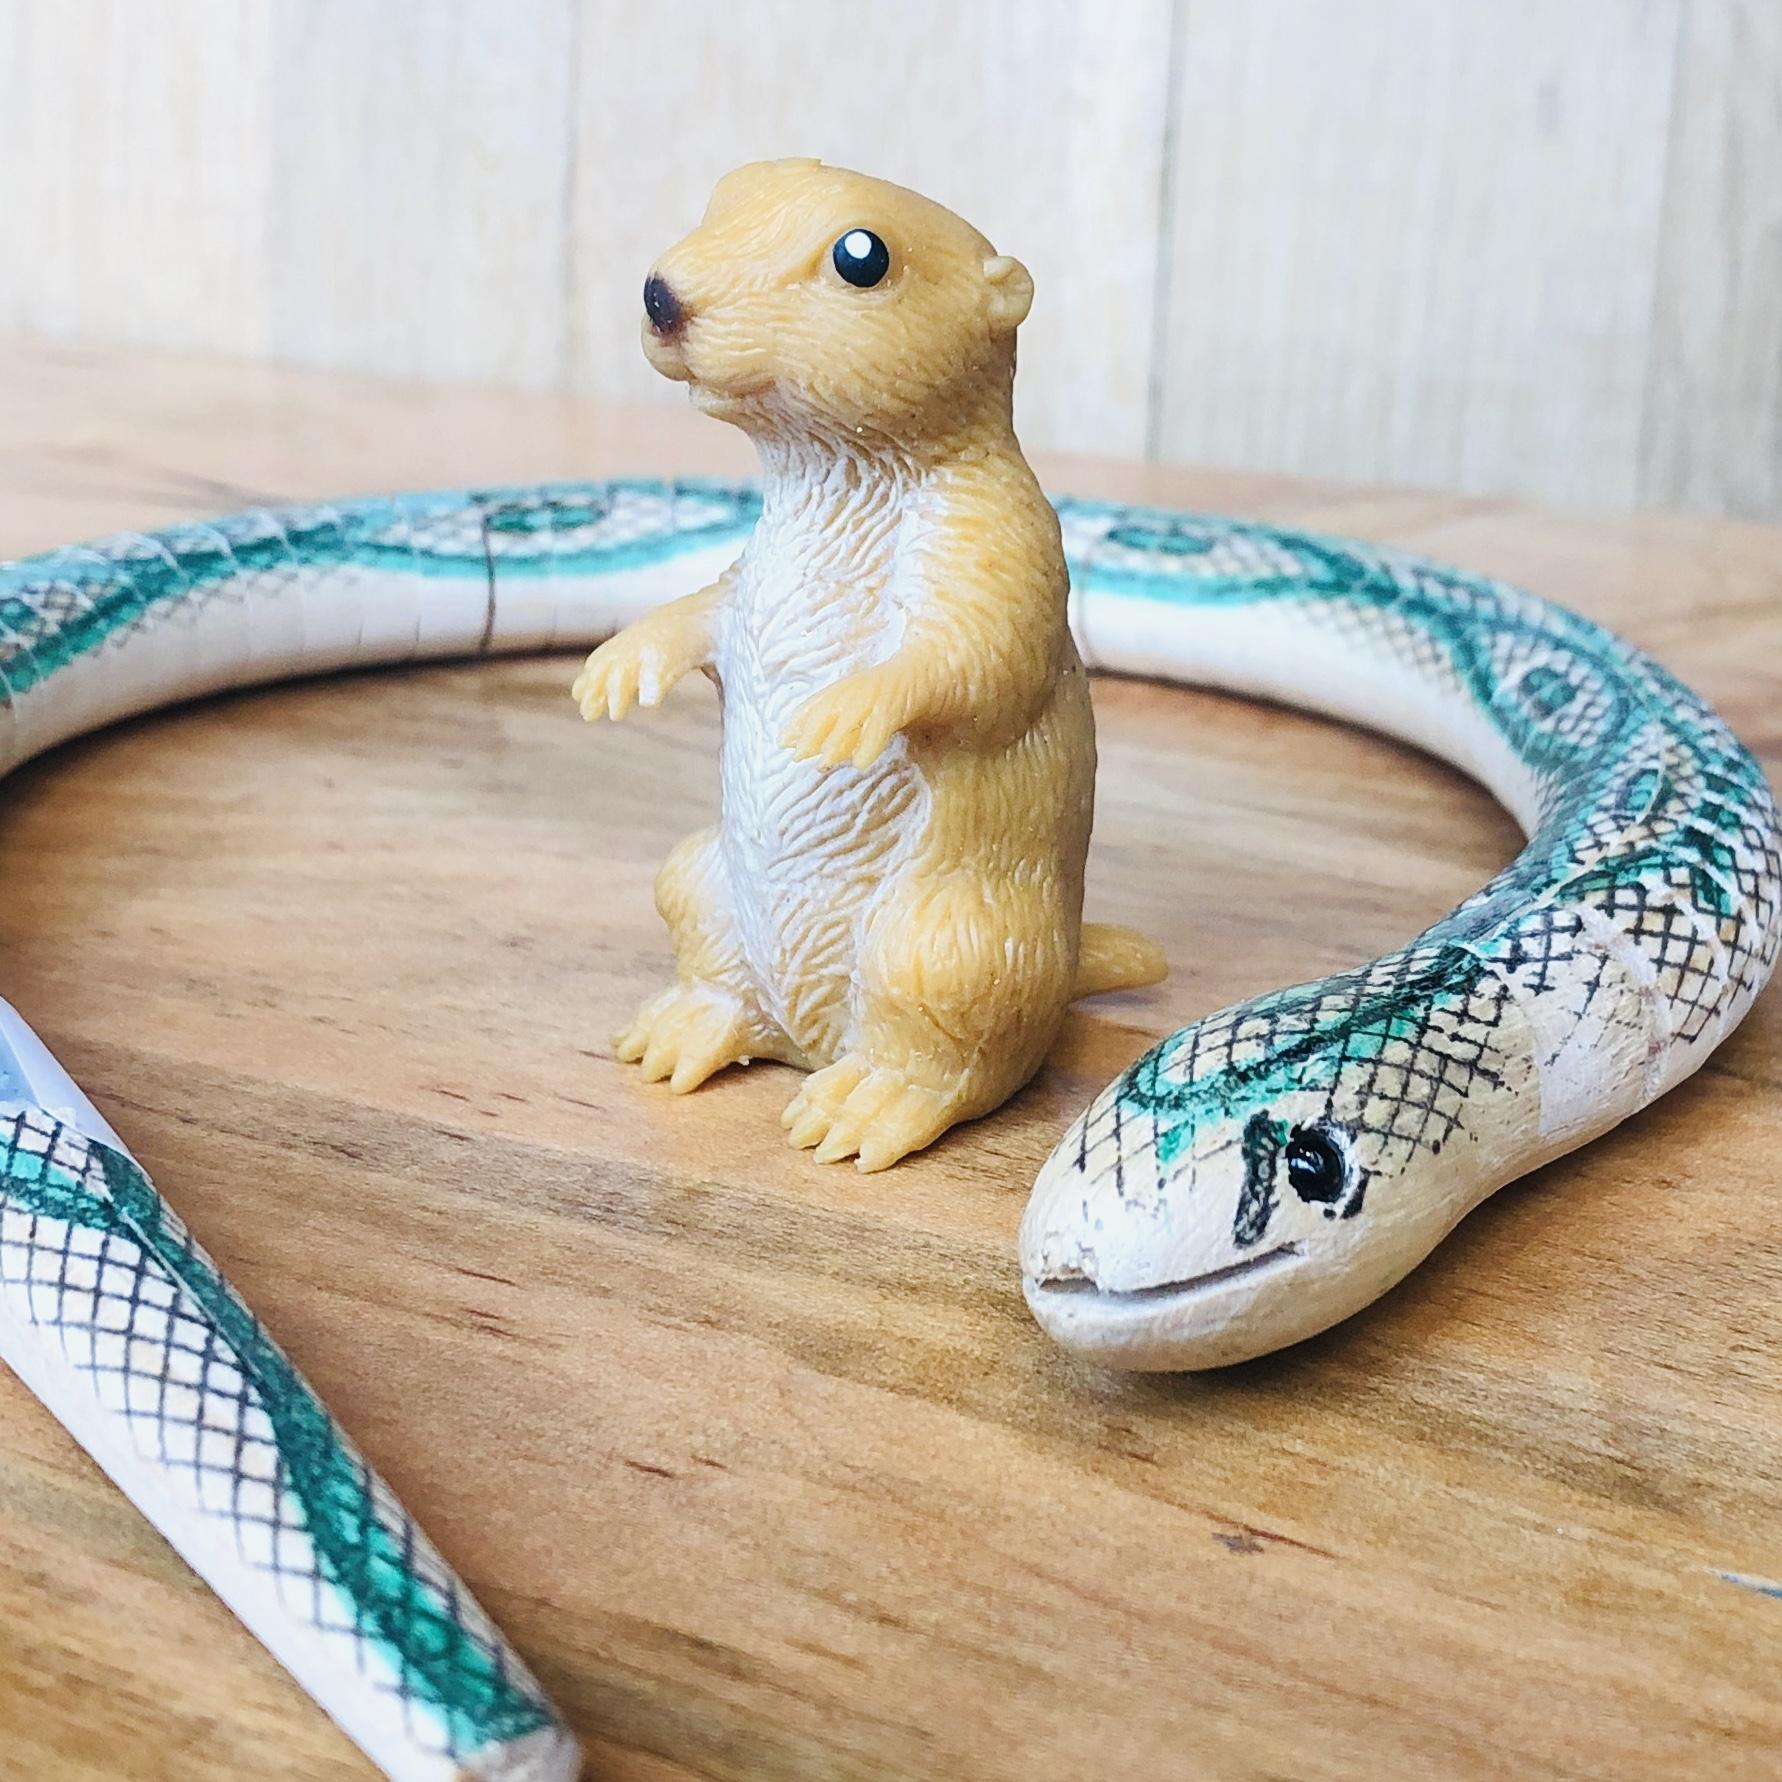 whats-TL&CE-snakeandpdog.jpg